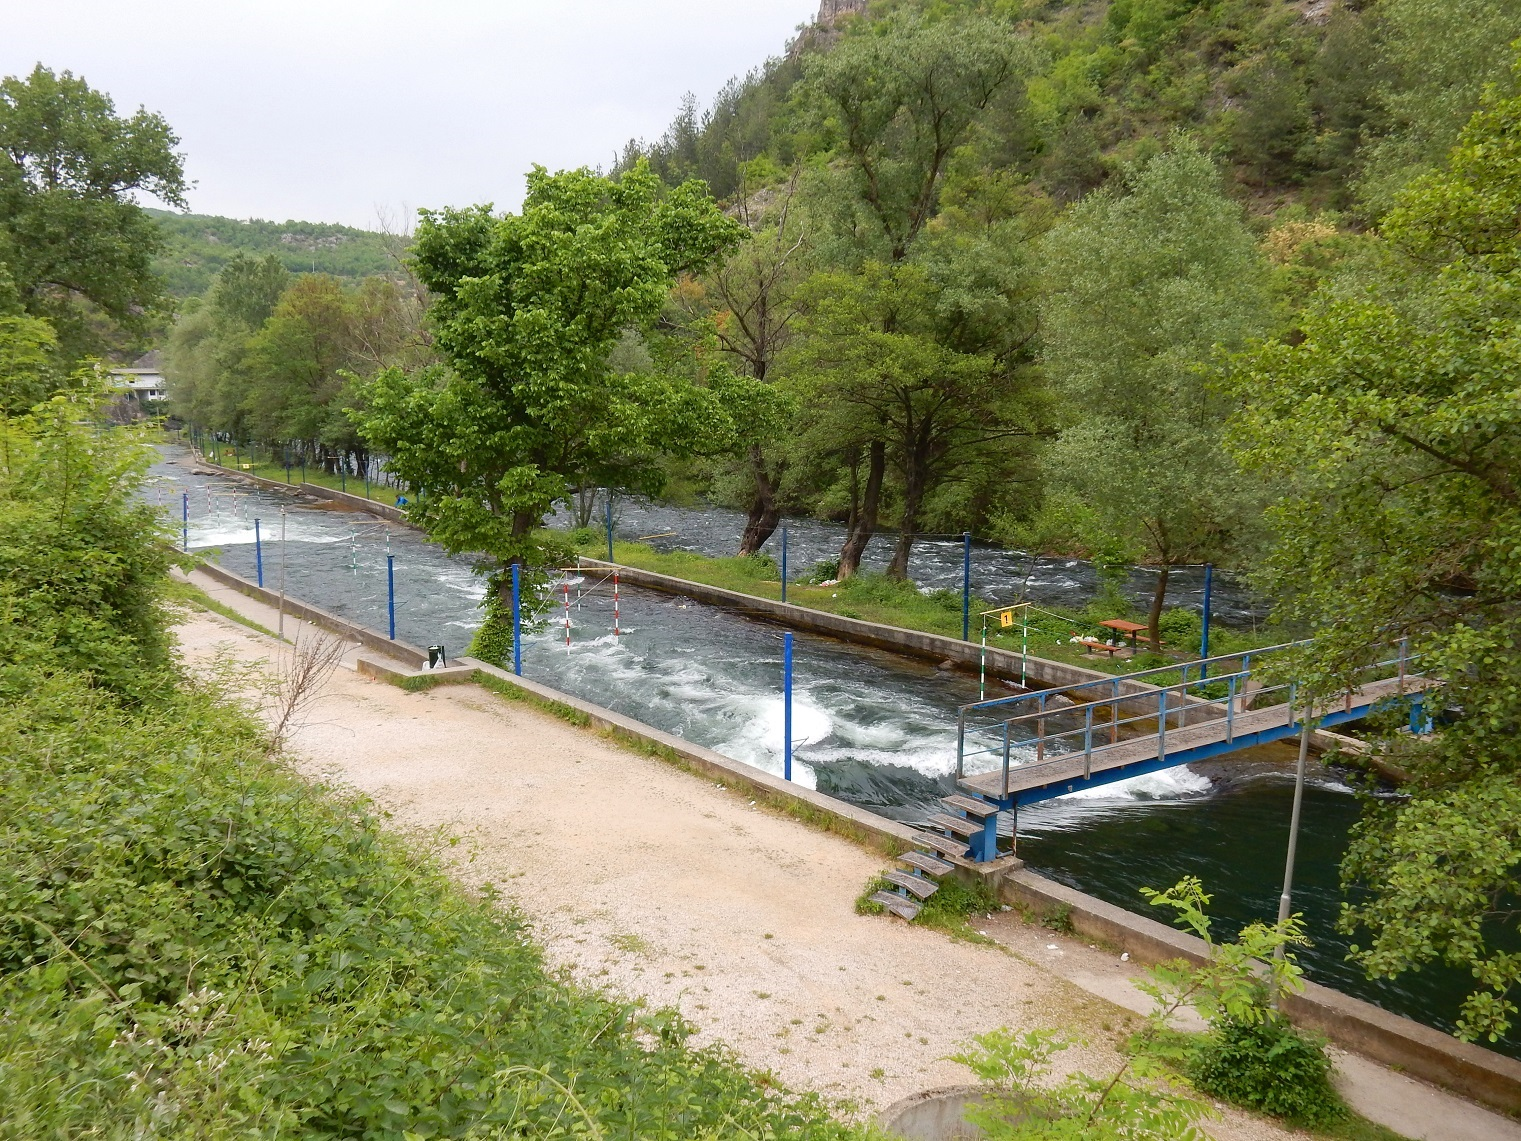 Skopje Canoeing track Matka Canyon